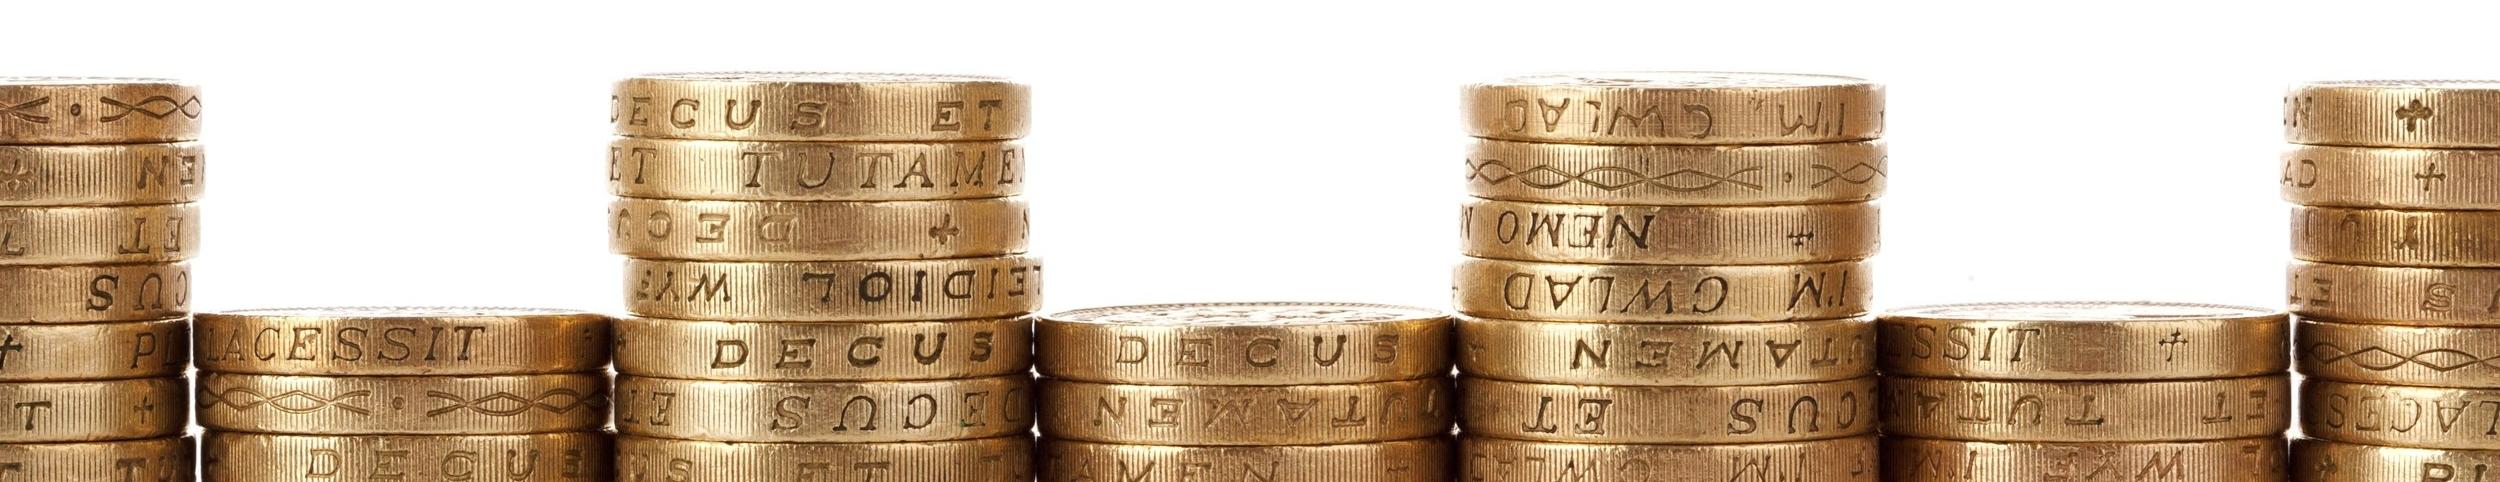 business-cash-coins-41301.jpg